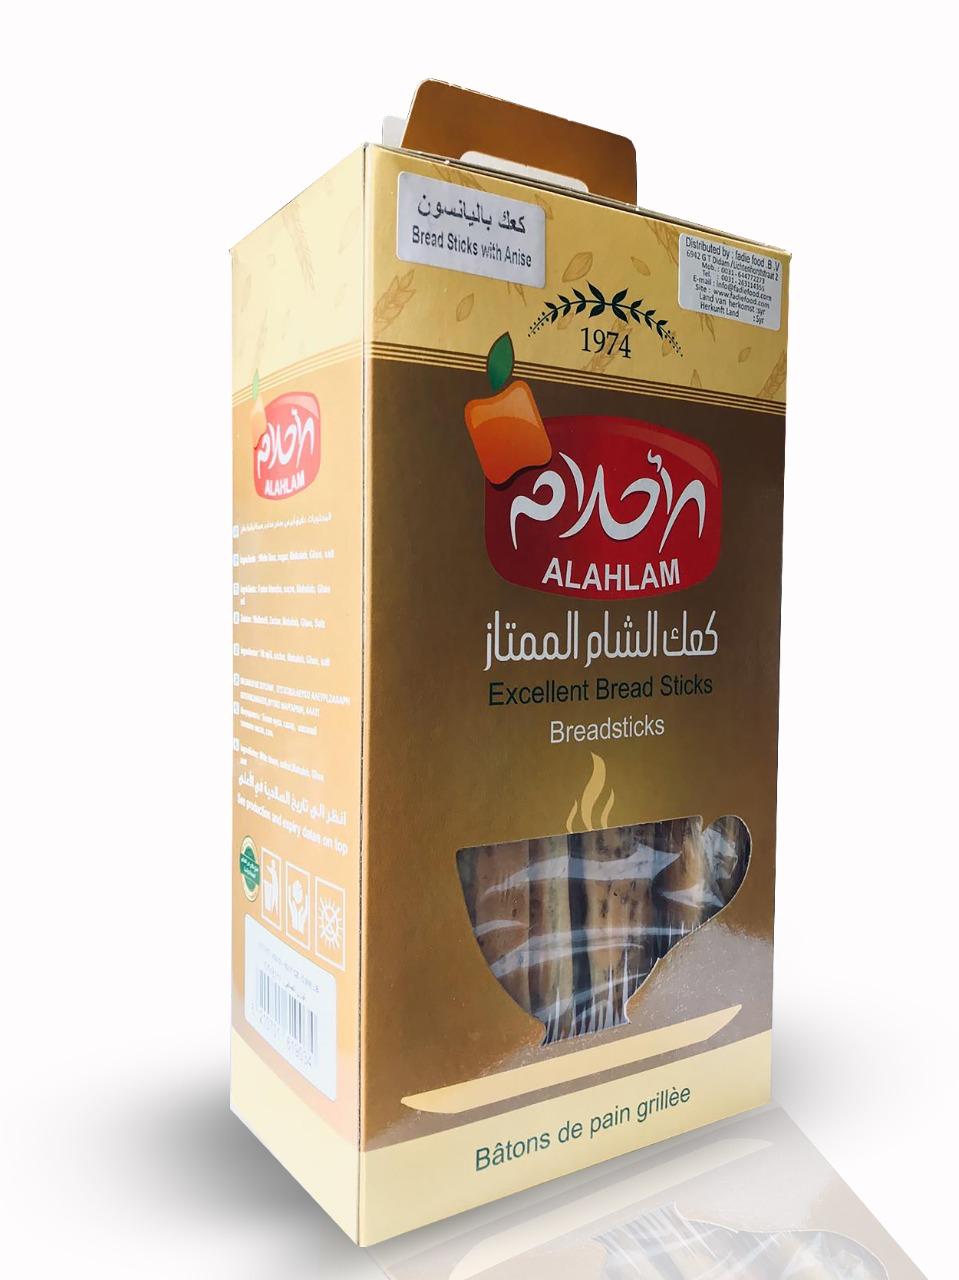 Al Ahlam Zwieback (Kaak mit Anis) 454g  كعك شاي باليانسون الأحلام